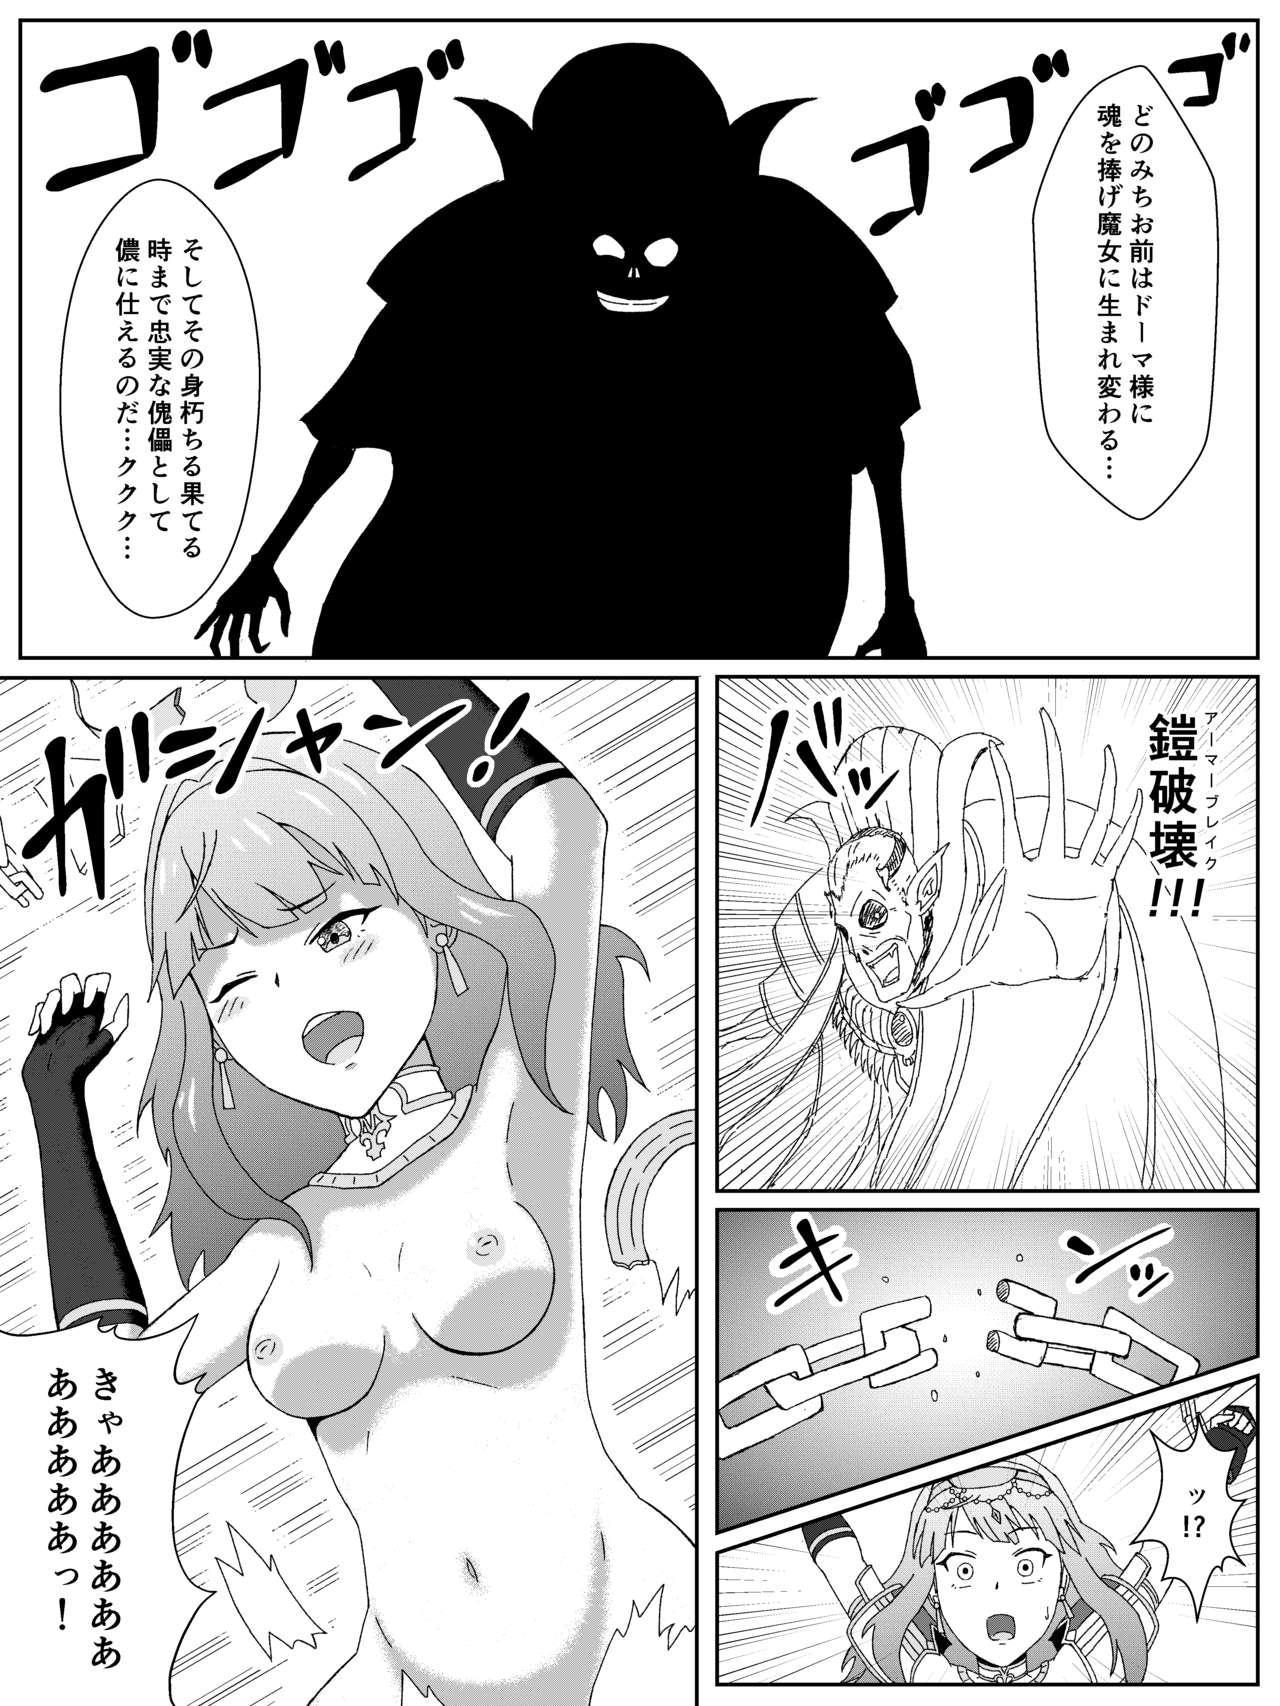 Fire Emblem Echoes no Celica Akuochi Manga 3